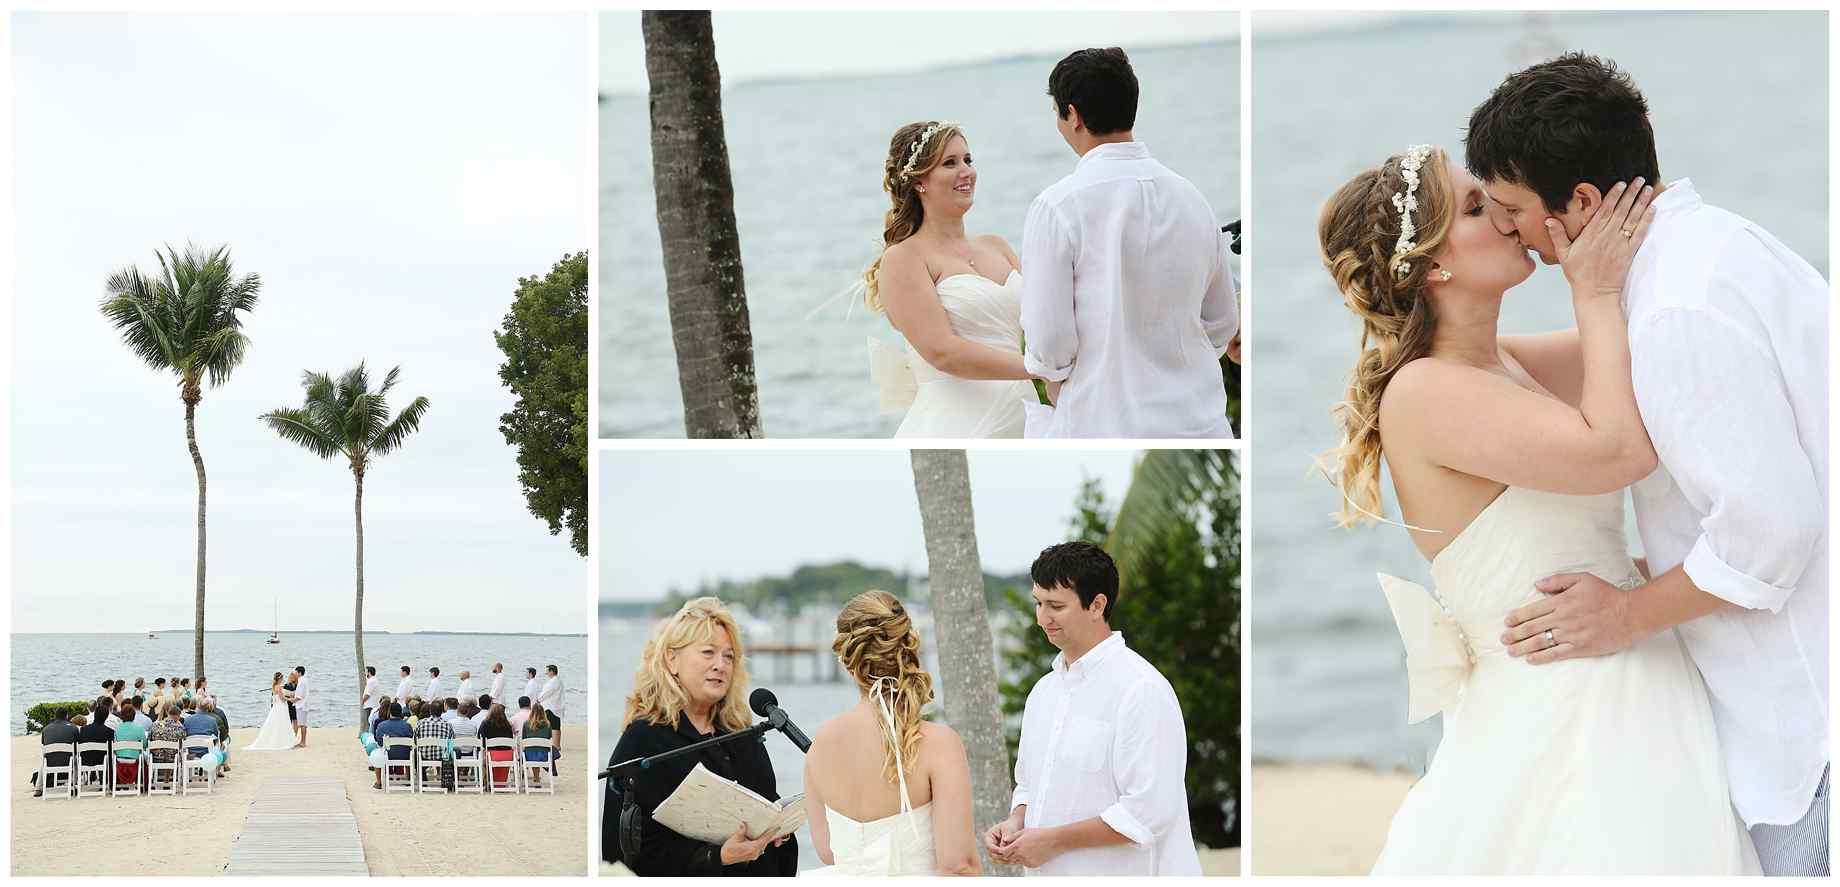 Key-Largo-Beach-Wedding-Photos-038